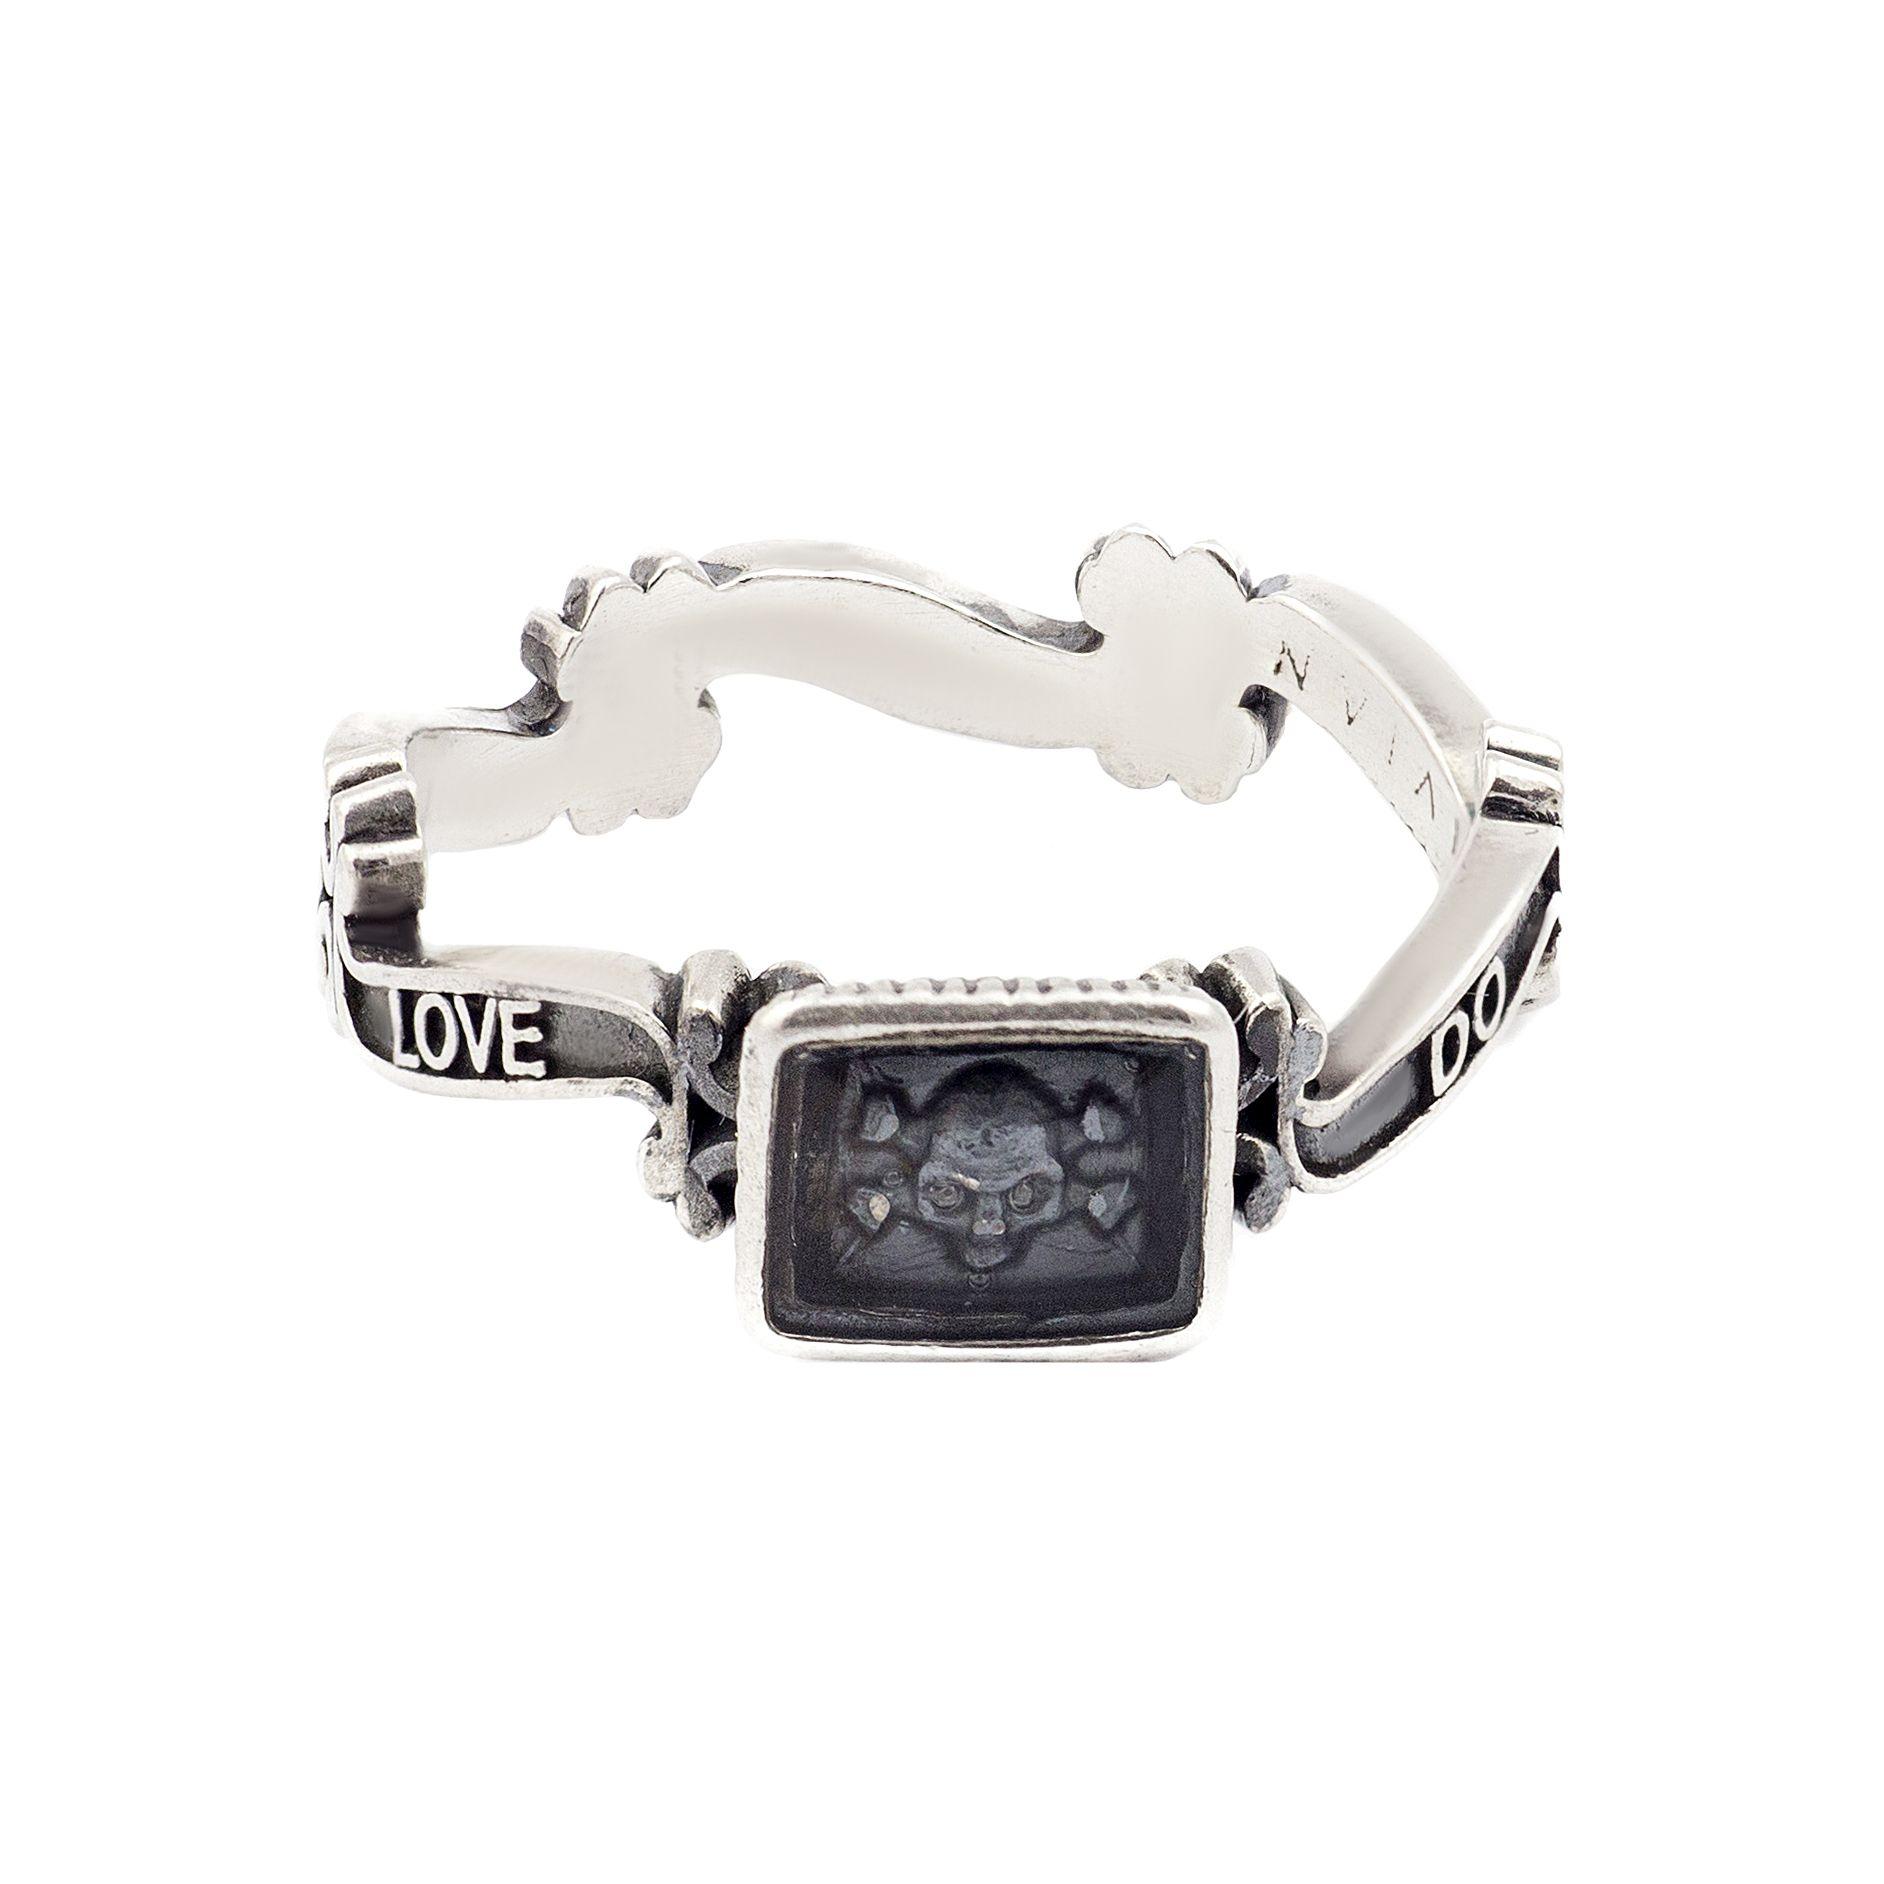 Memento mori skull ring  #viviangioielli #silver #love #blessedlove #ring #mementomori #exvoto #sacredring #skullring #heart #anelloteschio